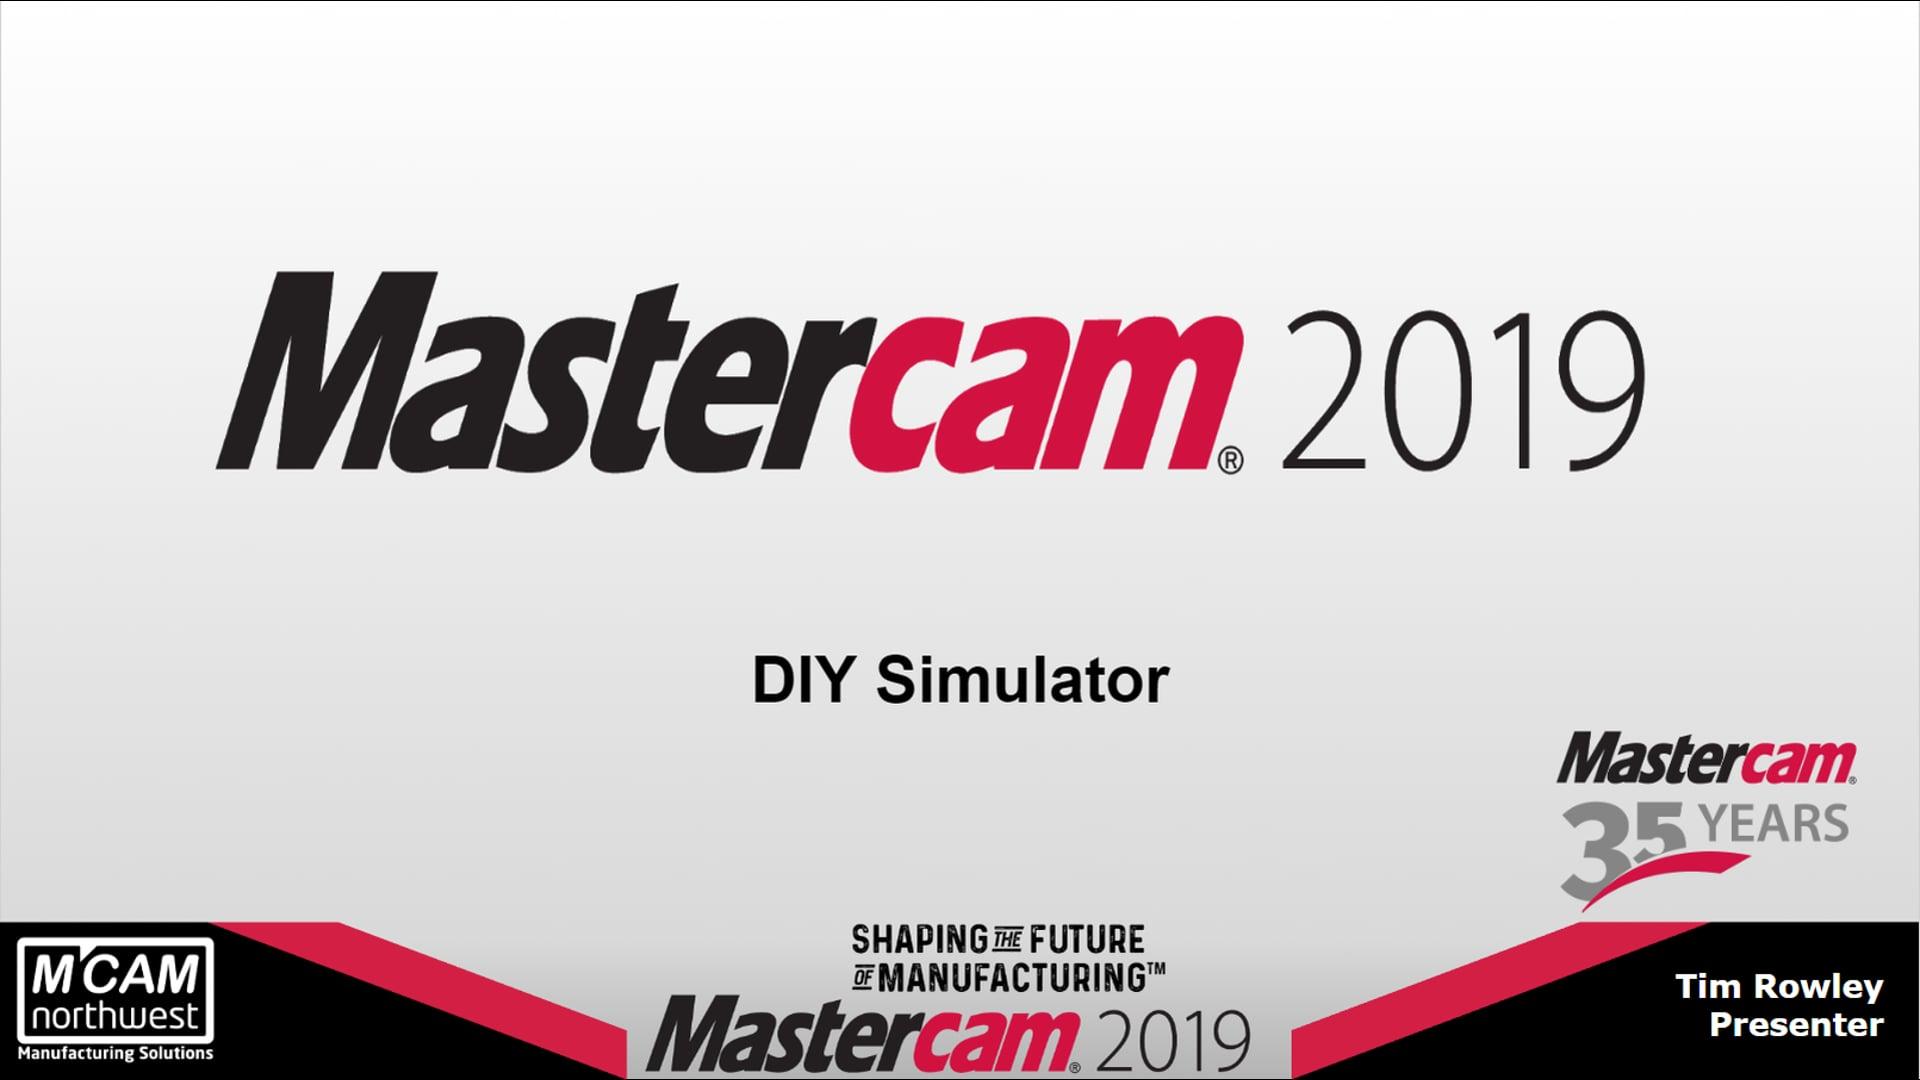 DIY Mastercam Simulator